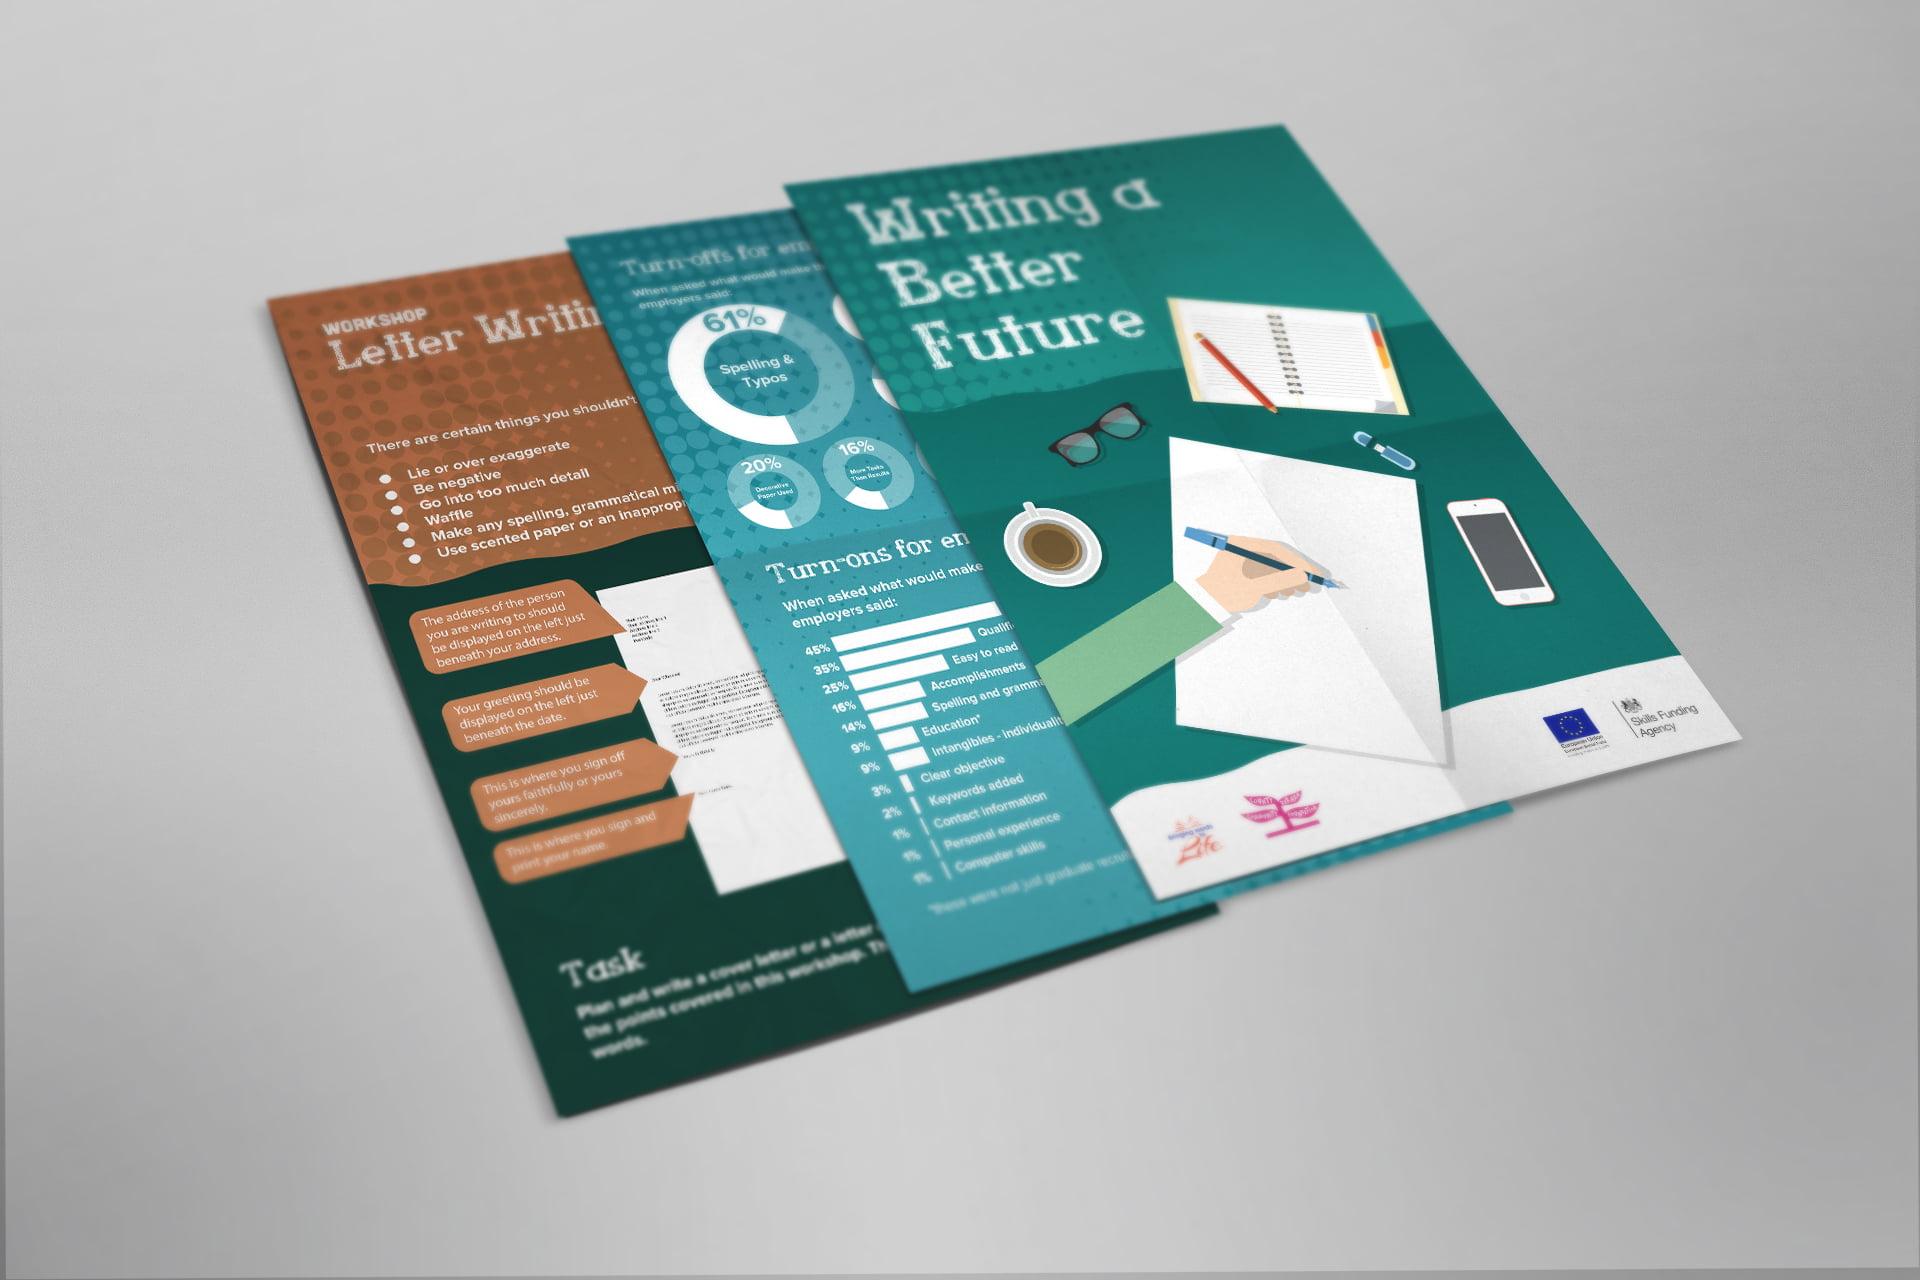 Bringing words To Life Workbook designed by Sleeky